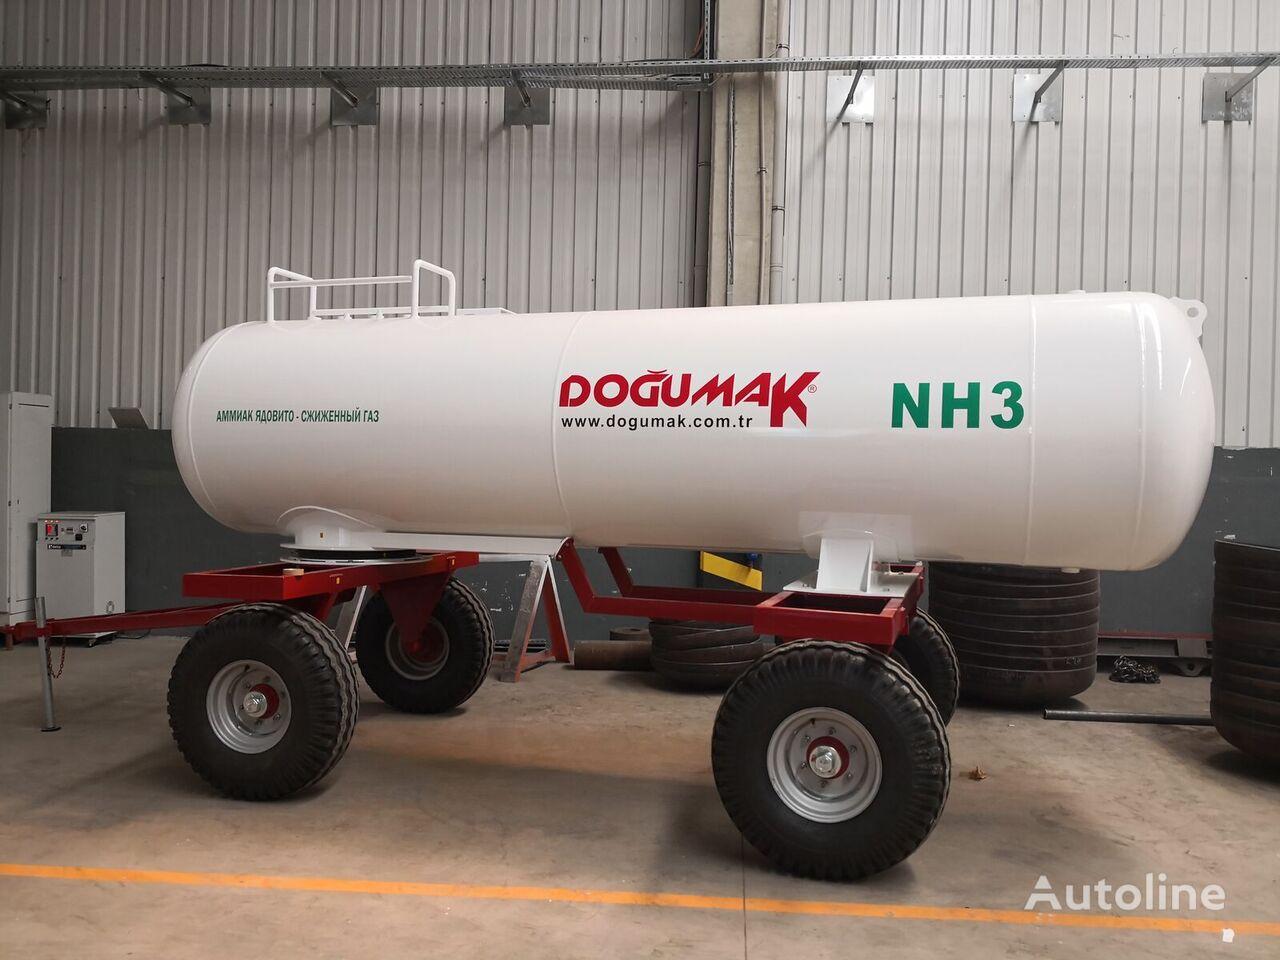 nowa cysterna gazowa DOĞUMAK Ammonia fertilizer application Tank (NH3) 5,5 M3